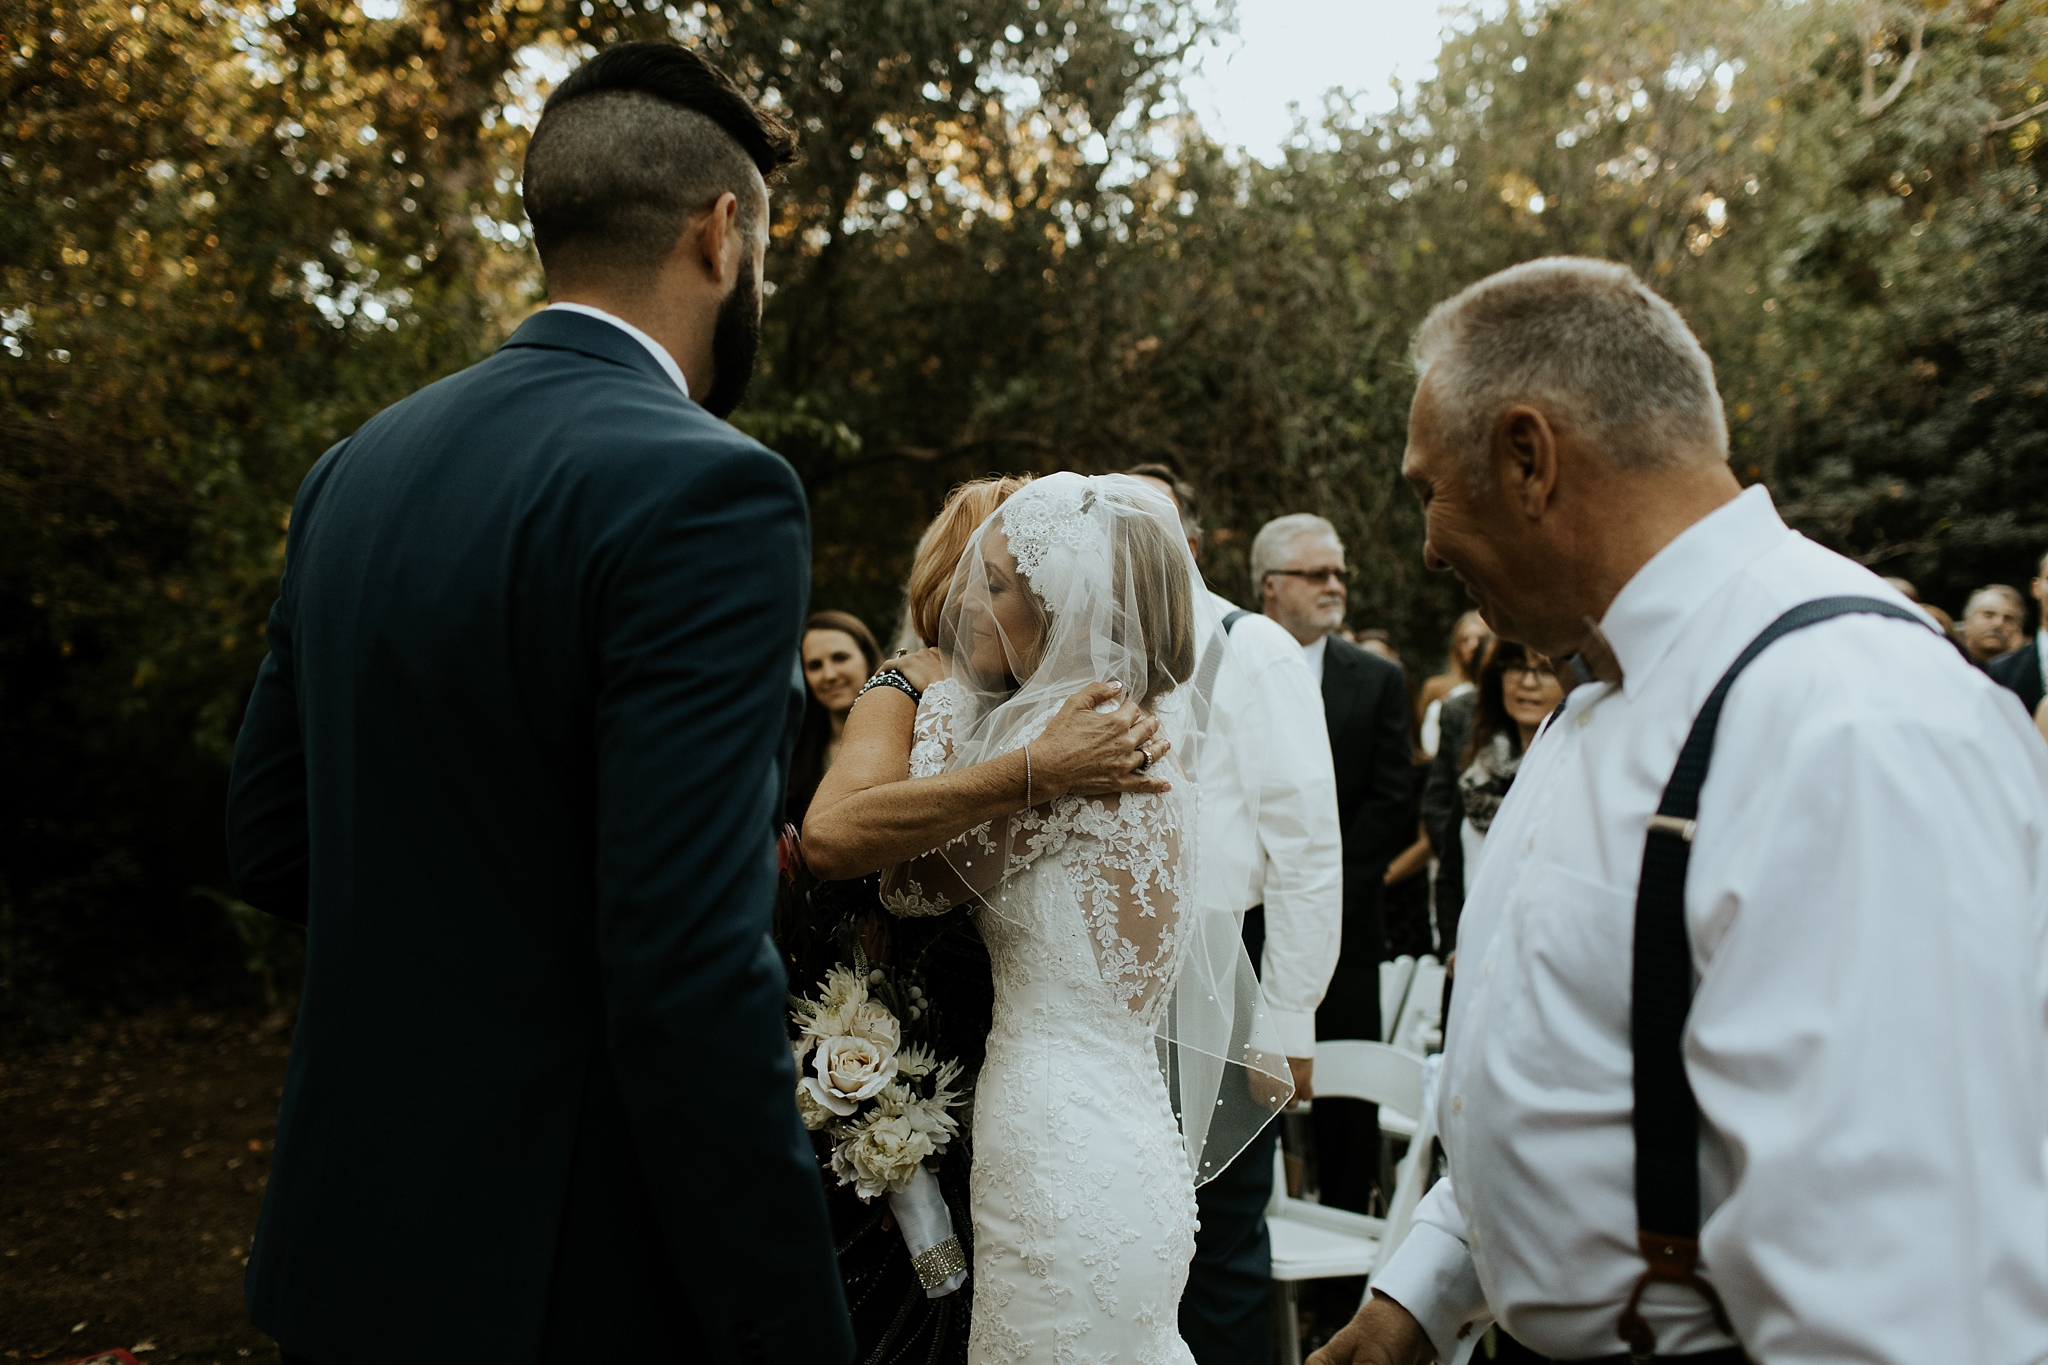 Bohemian Orcutt Ranch Wedding in Los Angeles California  - Los Angeles Californai Wedding Photographer_0034.jpg